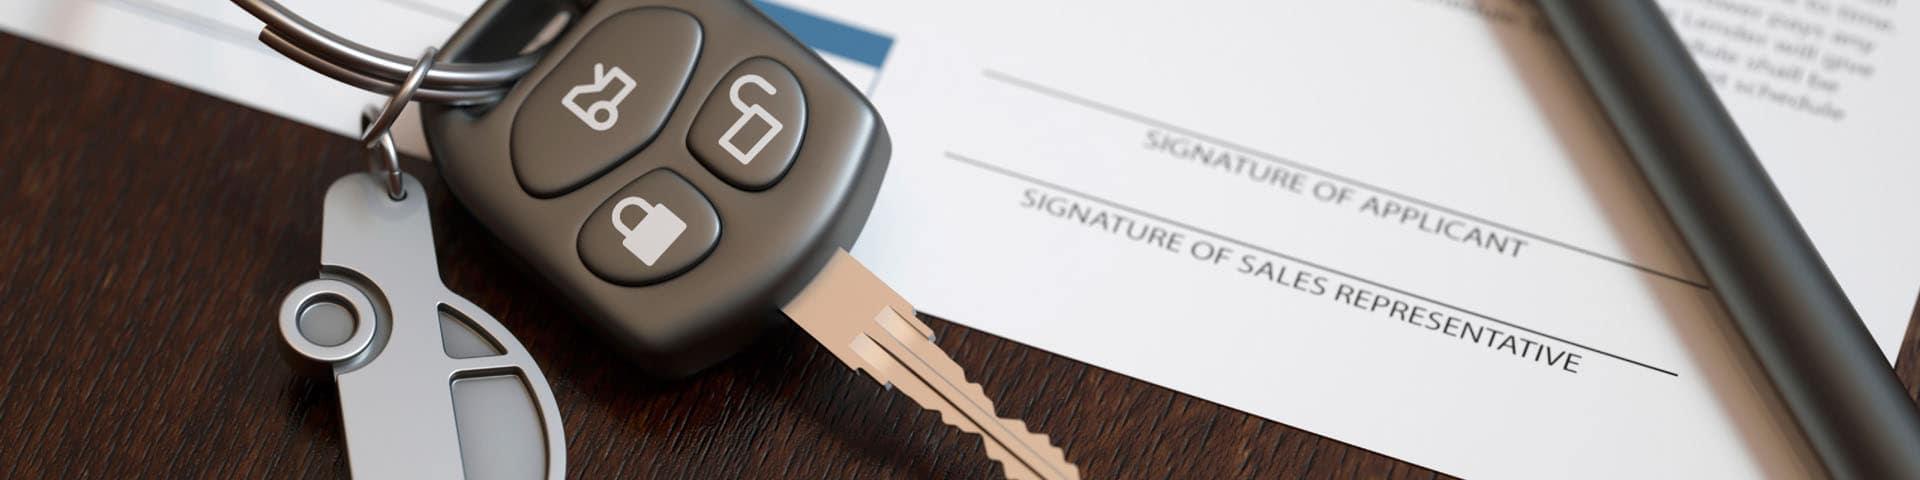 Bad Credit Financing at Nissan of Duarte